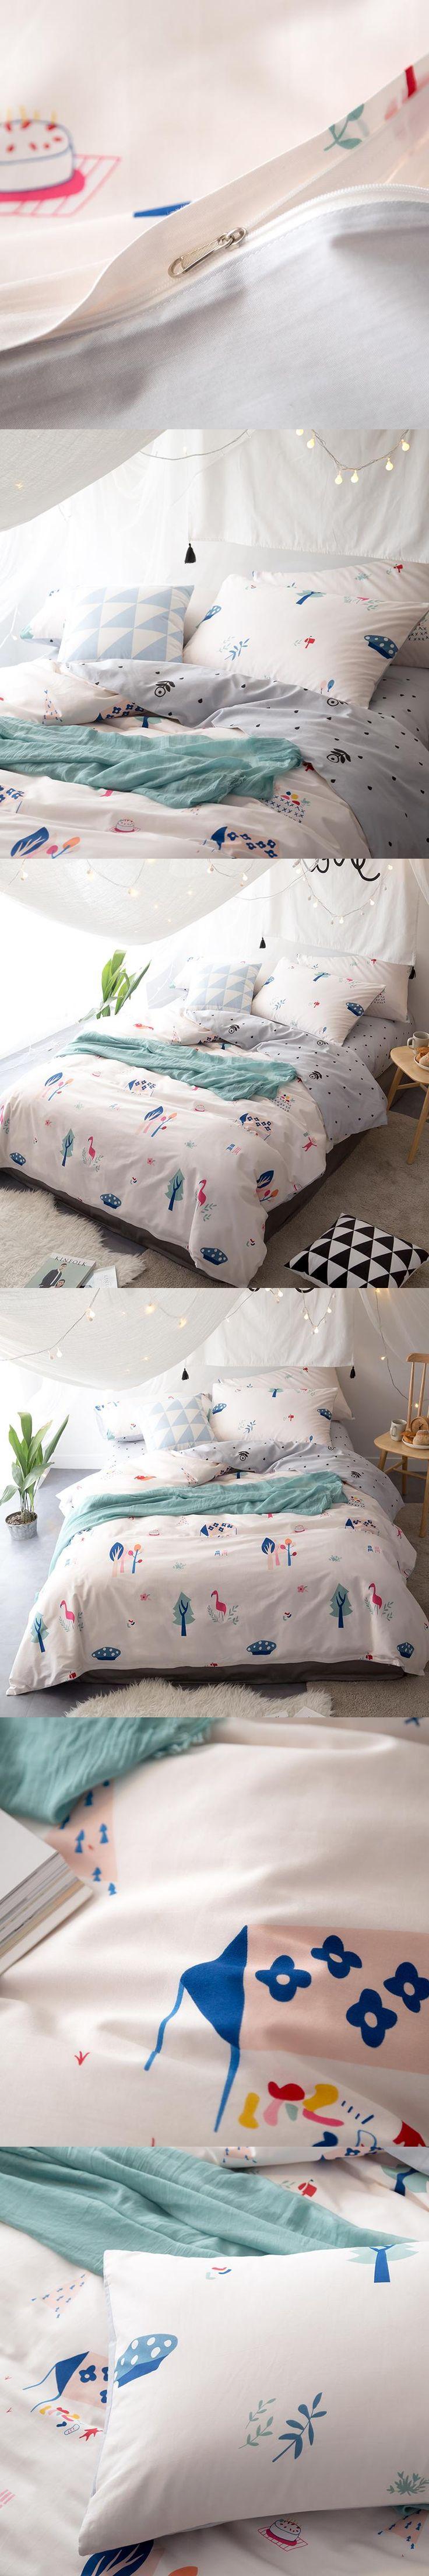 Papa&Mima Fresh Flamingo Trees 3/4Pcs Twin Queen King Size Bedding Soft Cotton Linens Duvet Cover Set Cartoon Style Bedding Sets